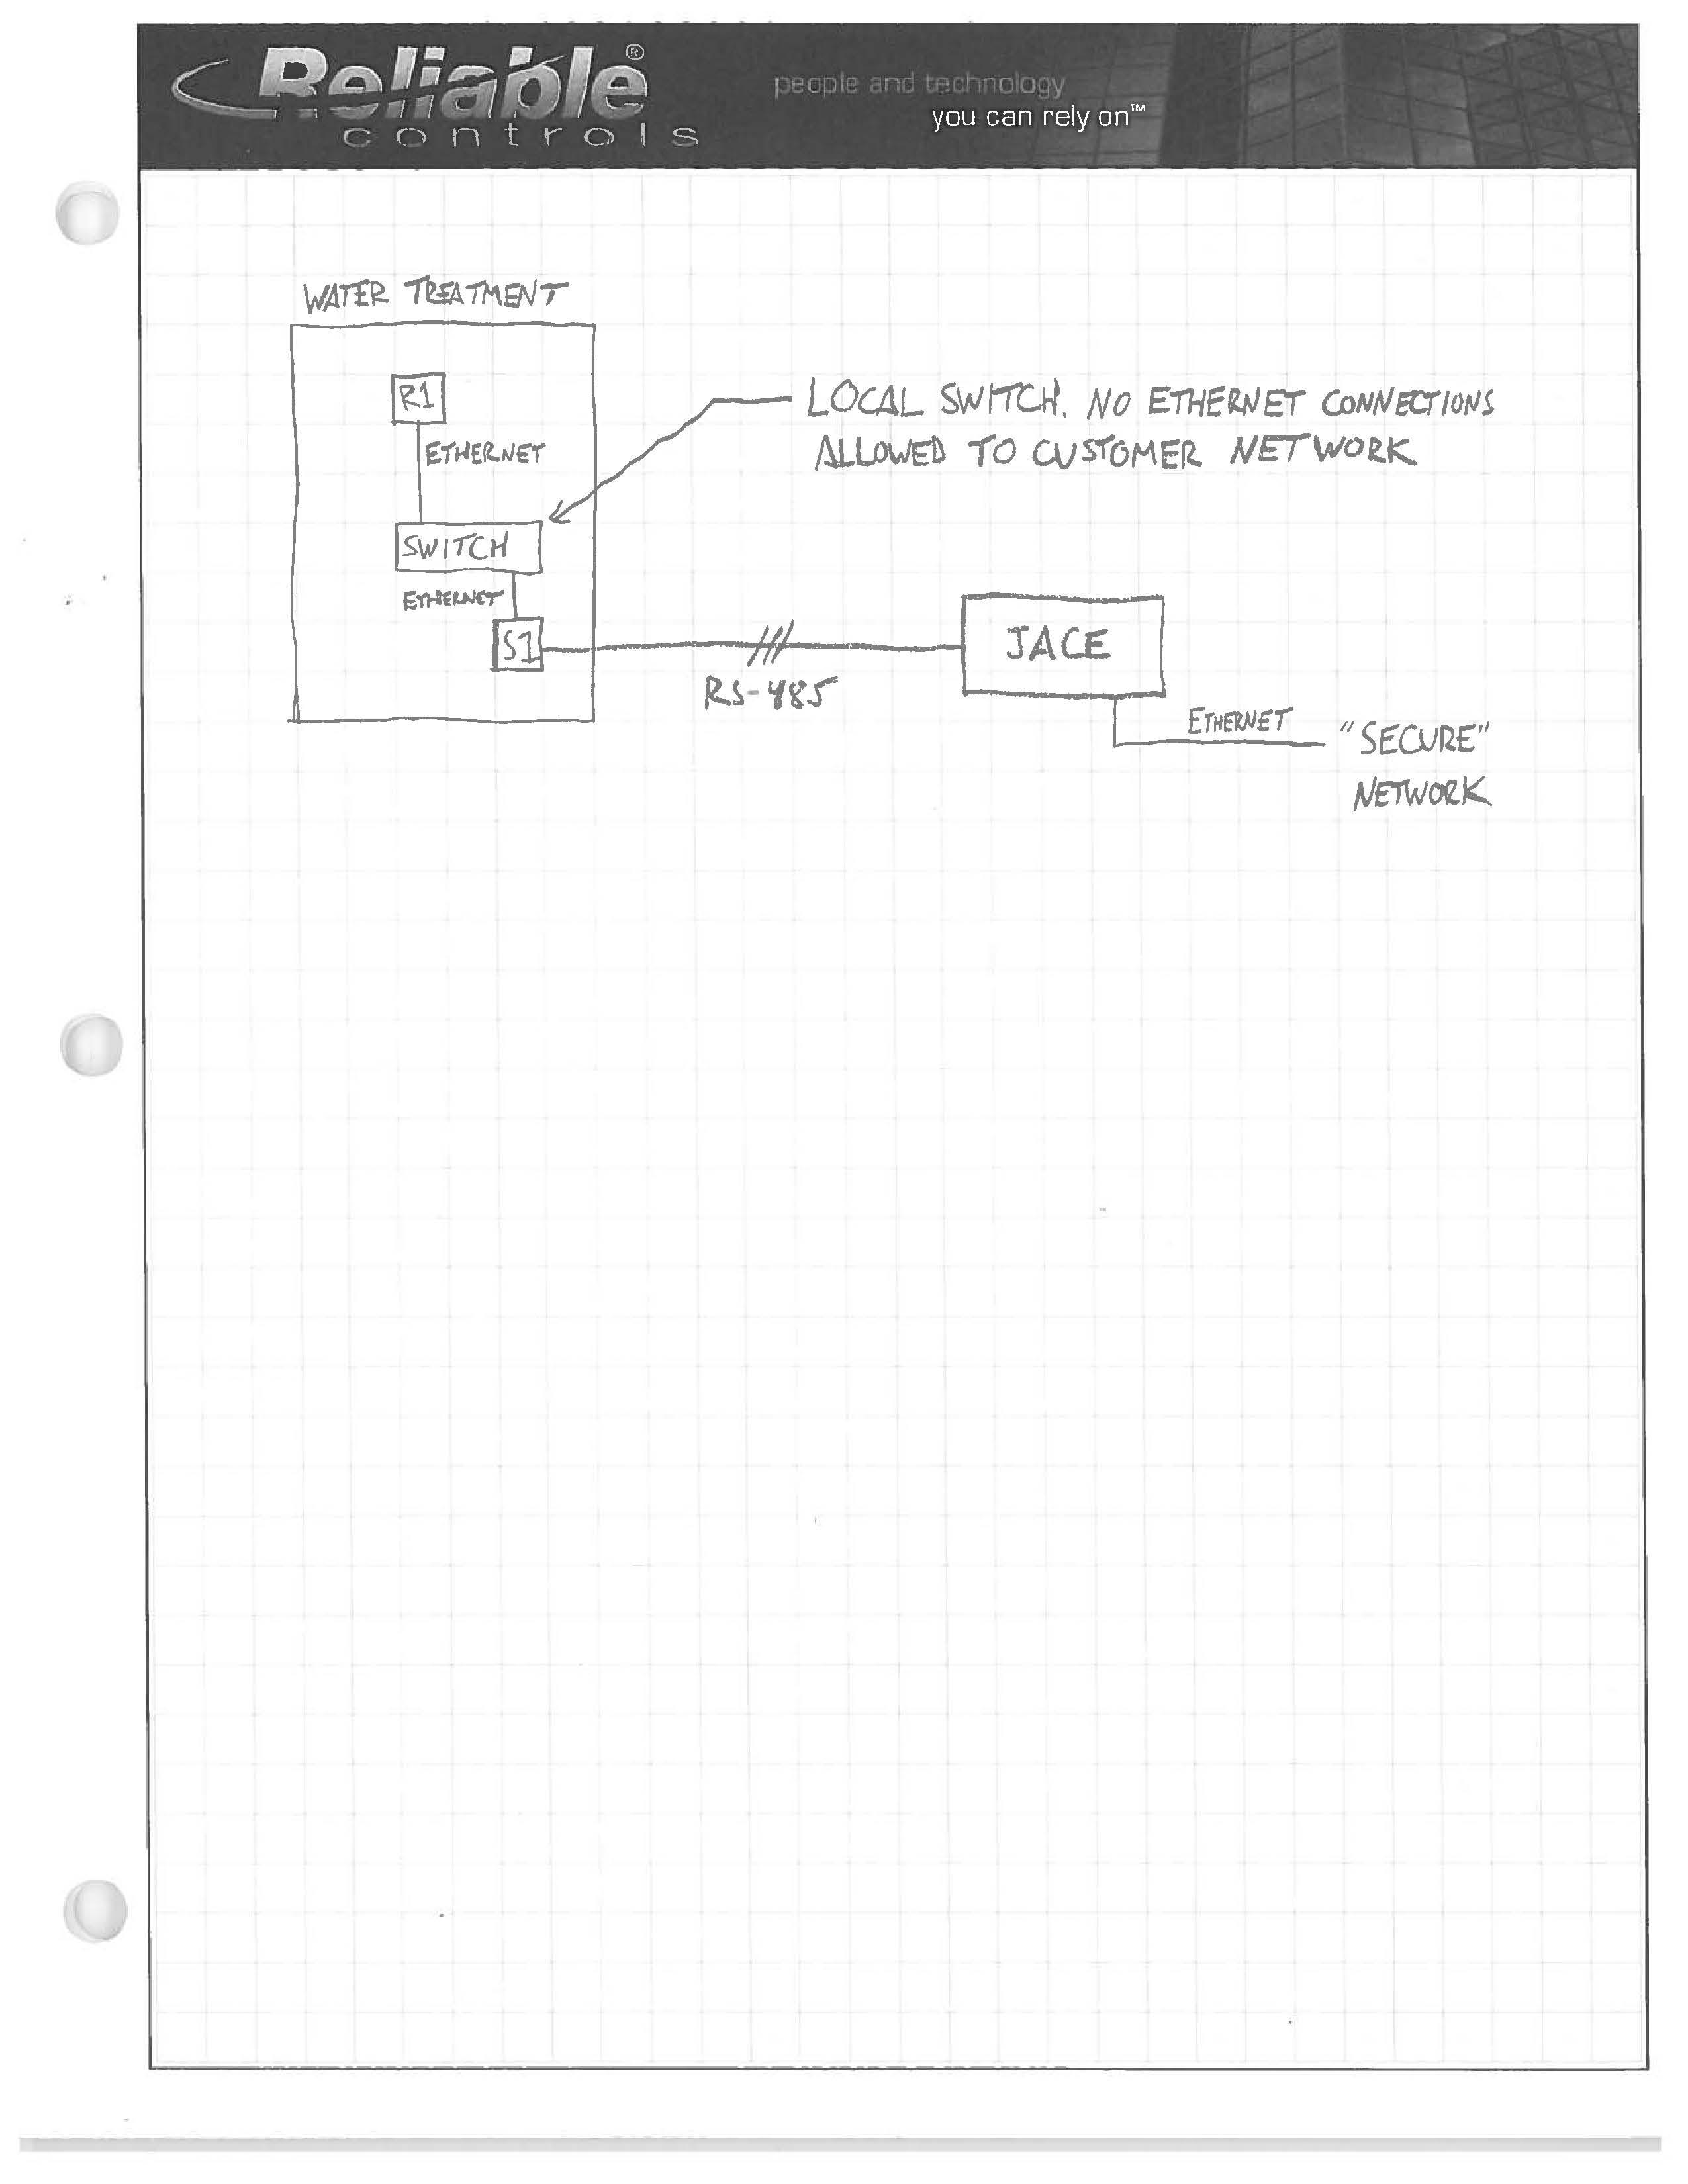 Monitoring SNAP PAC via Modbus RTU - Applications - OptoForums